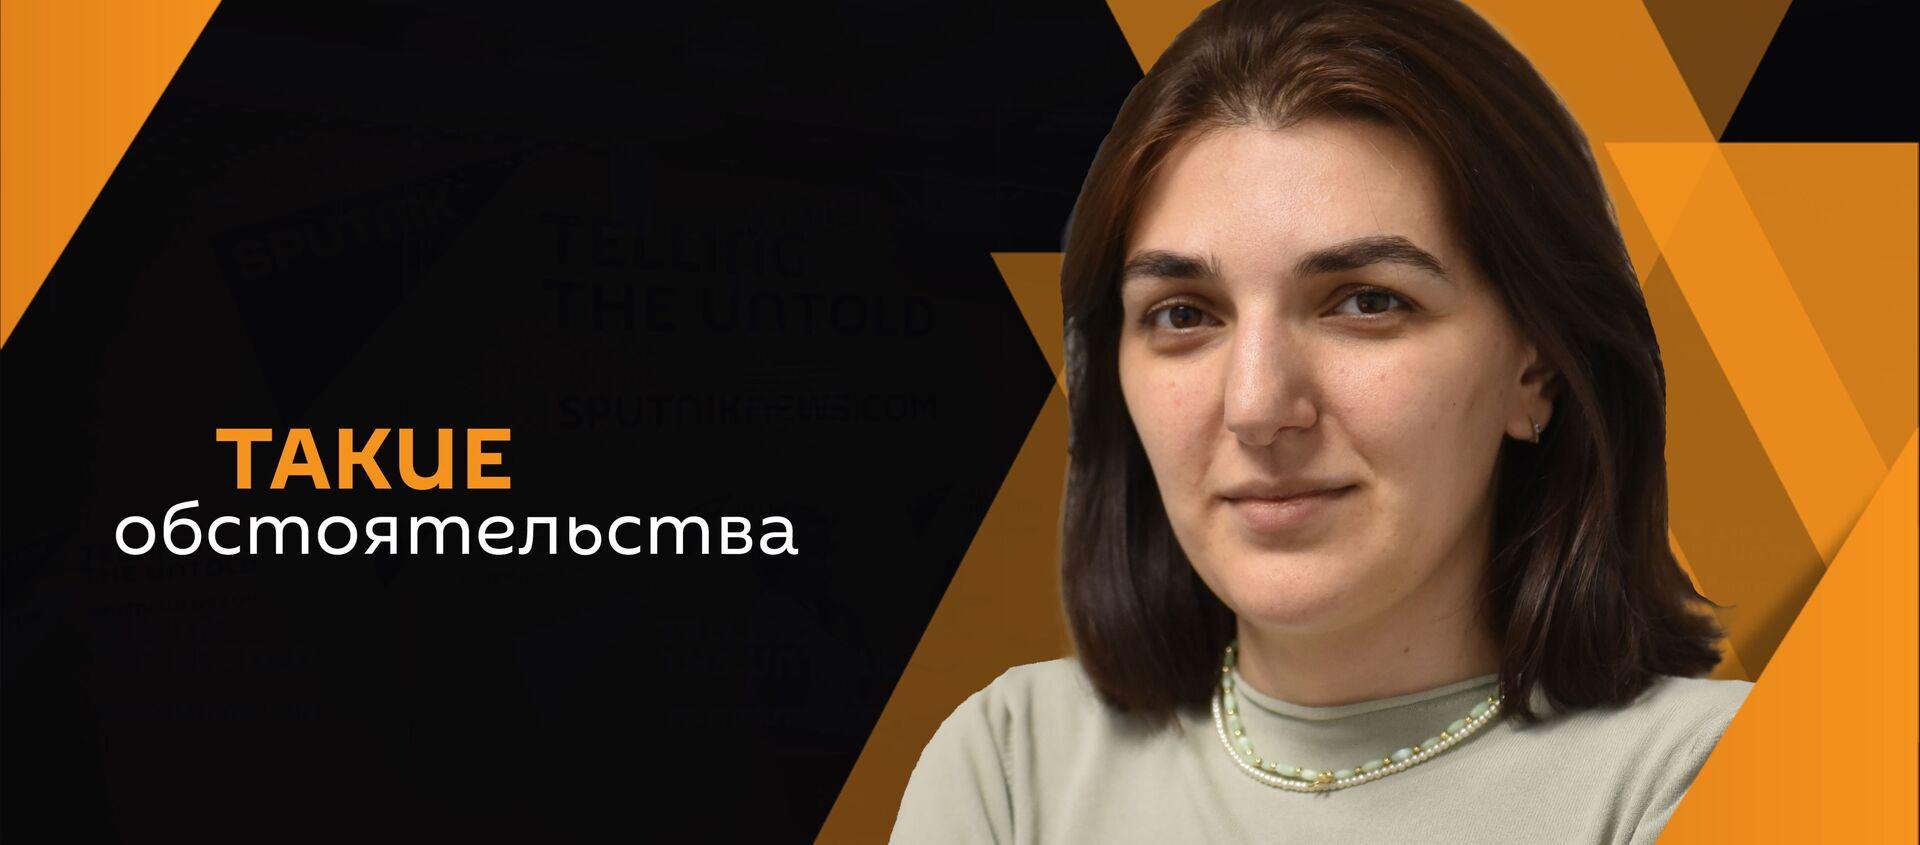 Аэлита Шакая - Sputnik Абхазия, 1920, 02.08.2021